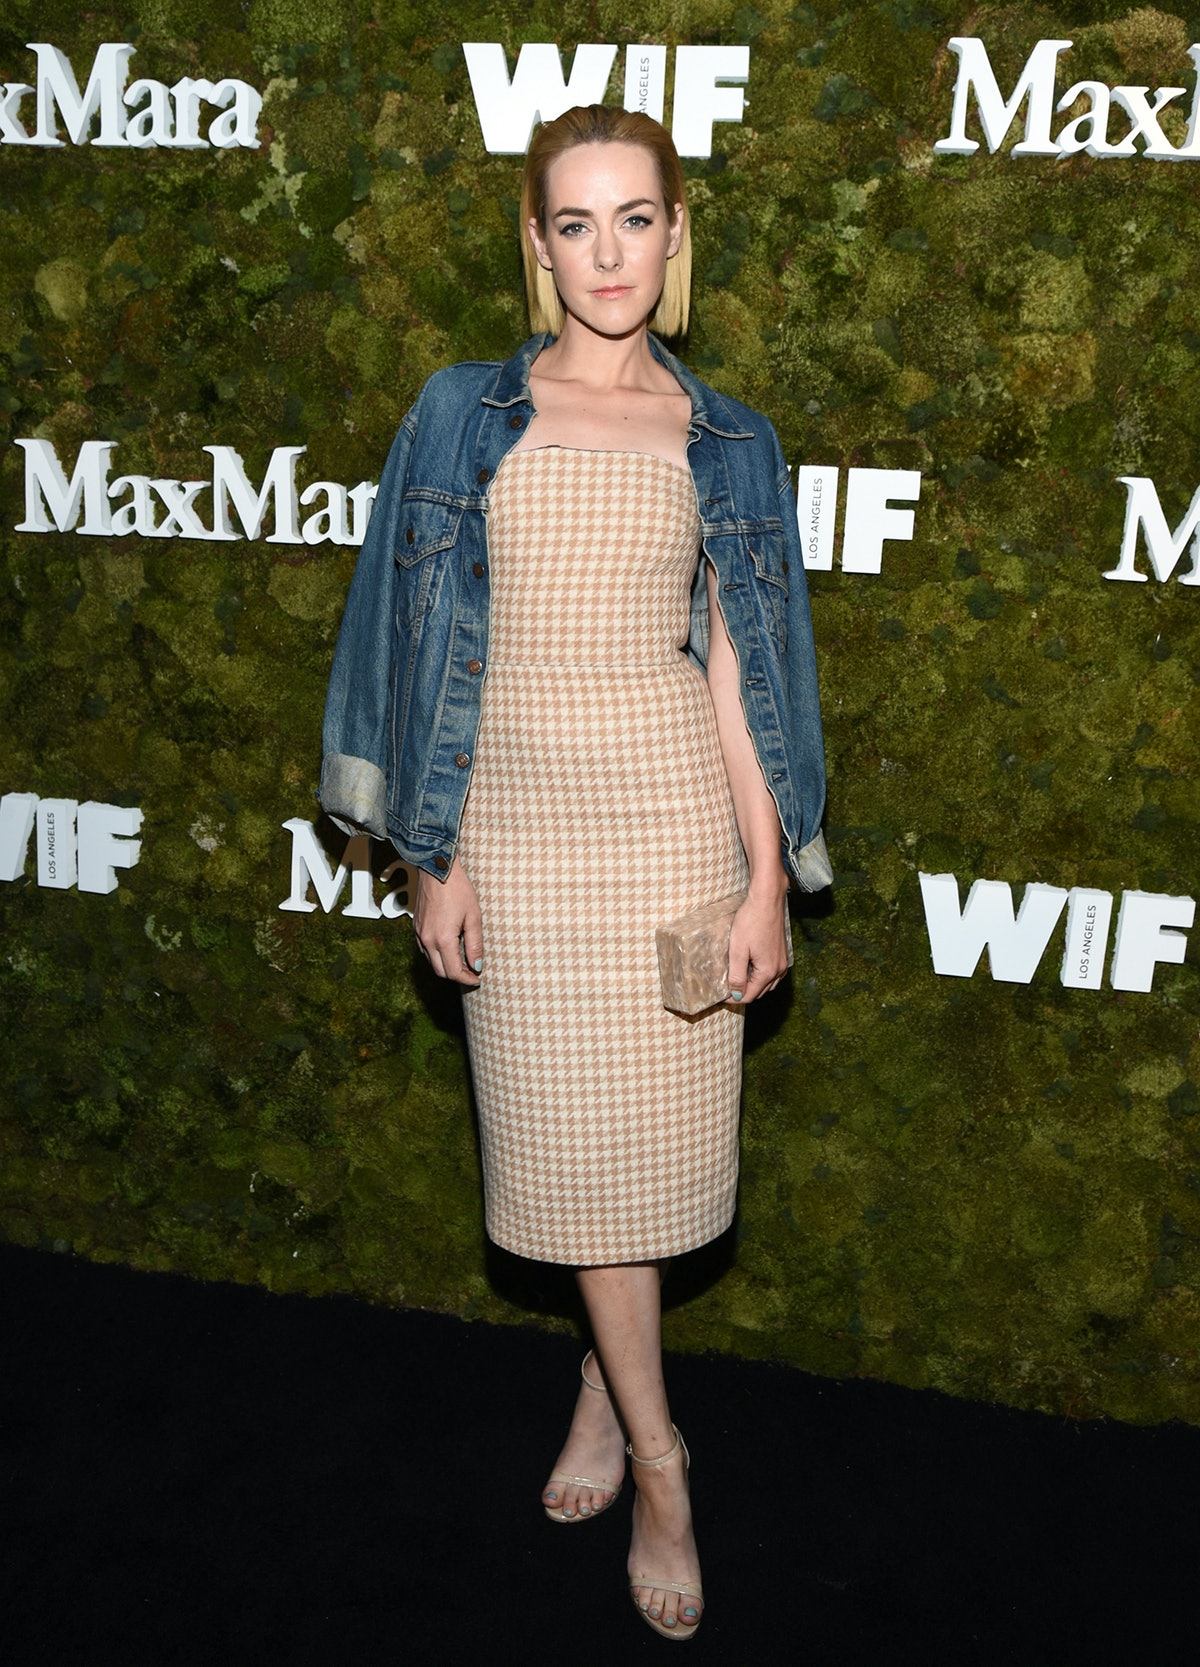 Jena Malone in Max Mara